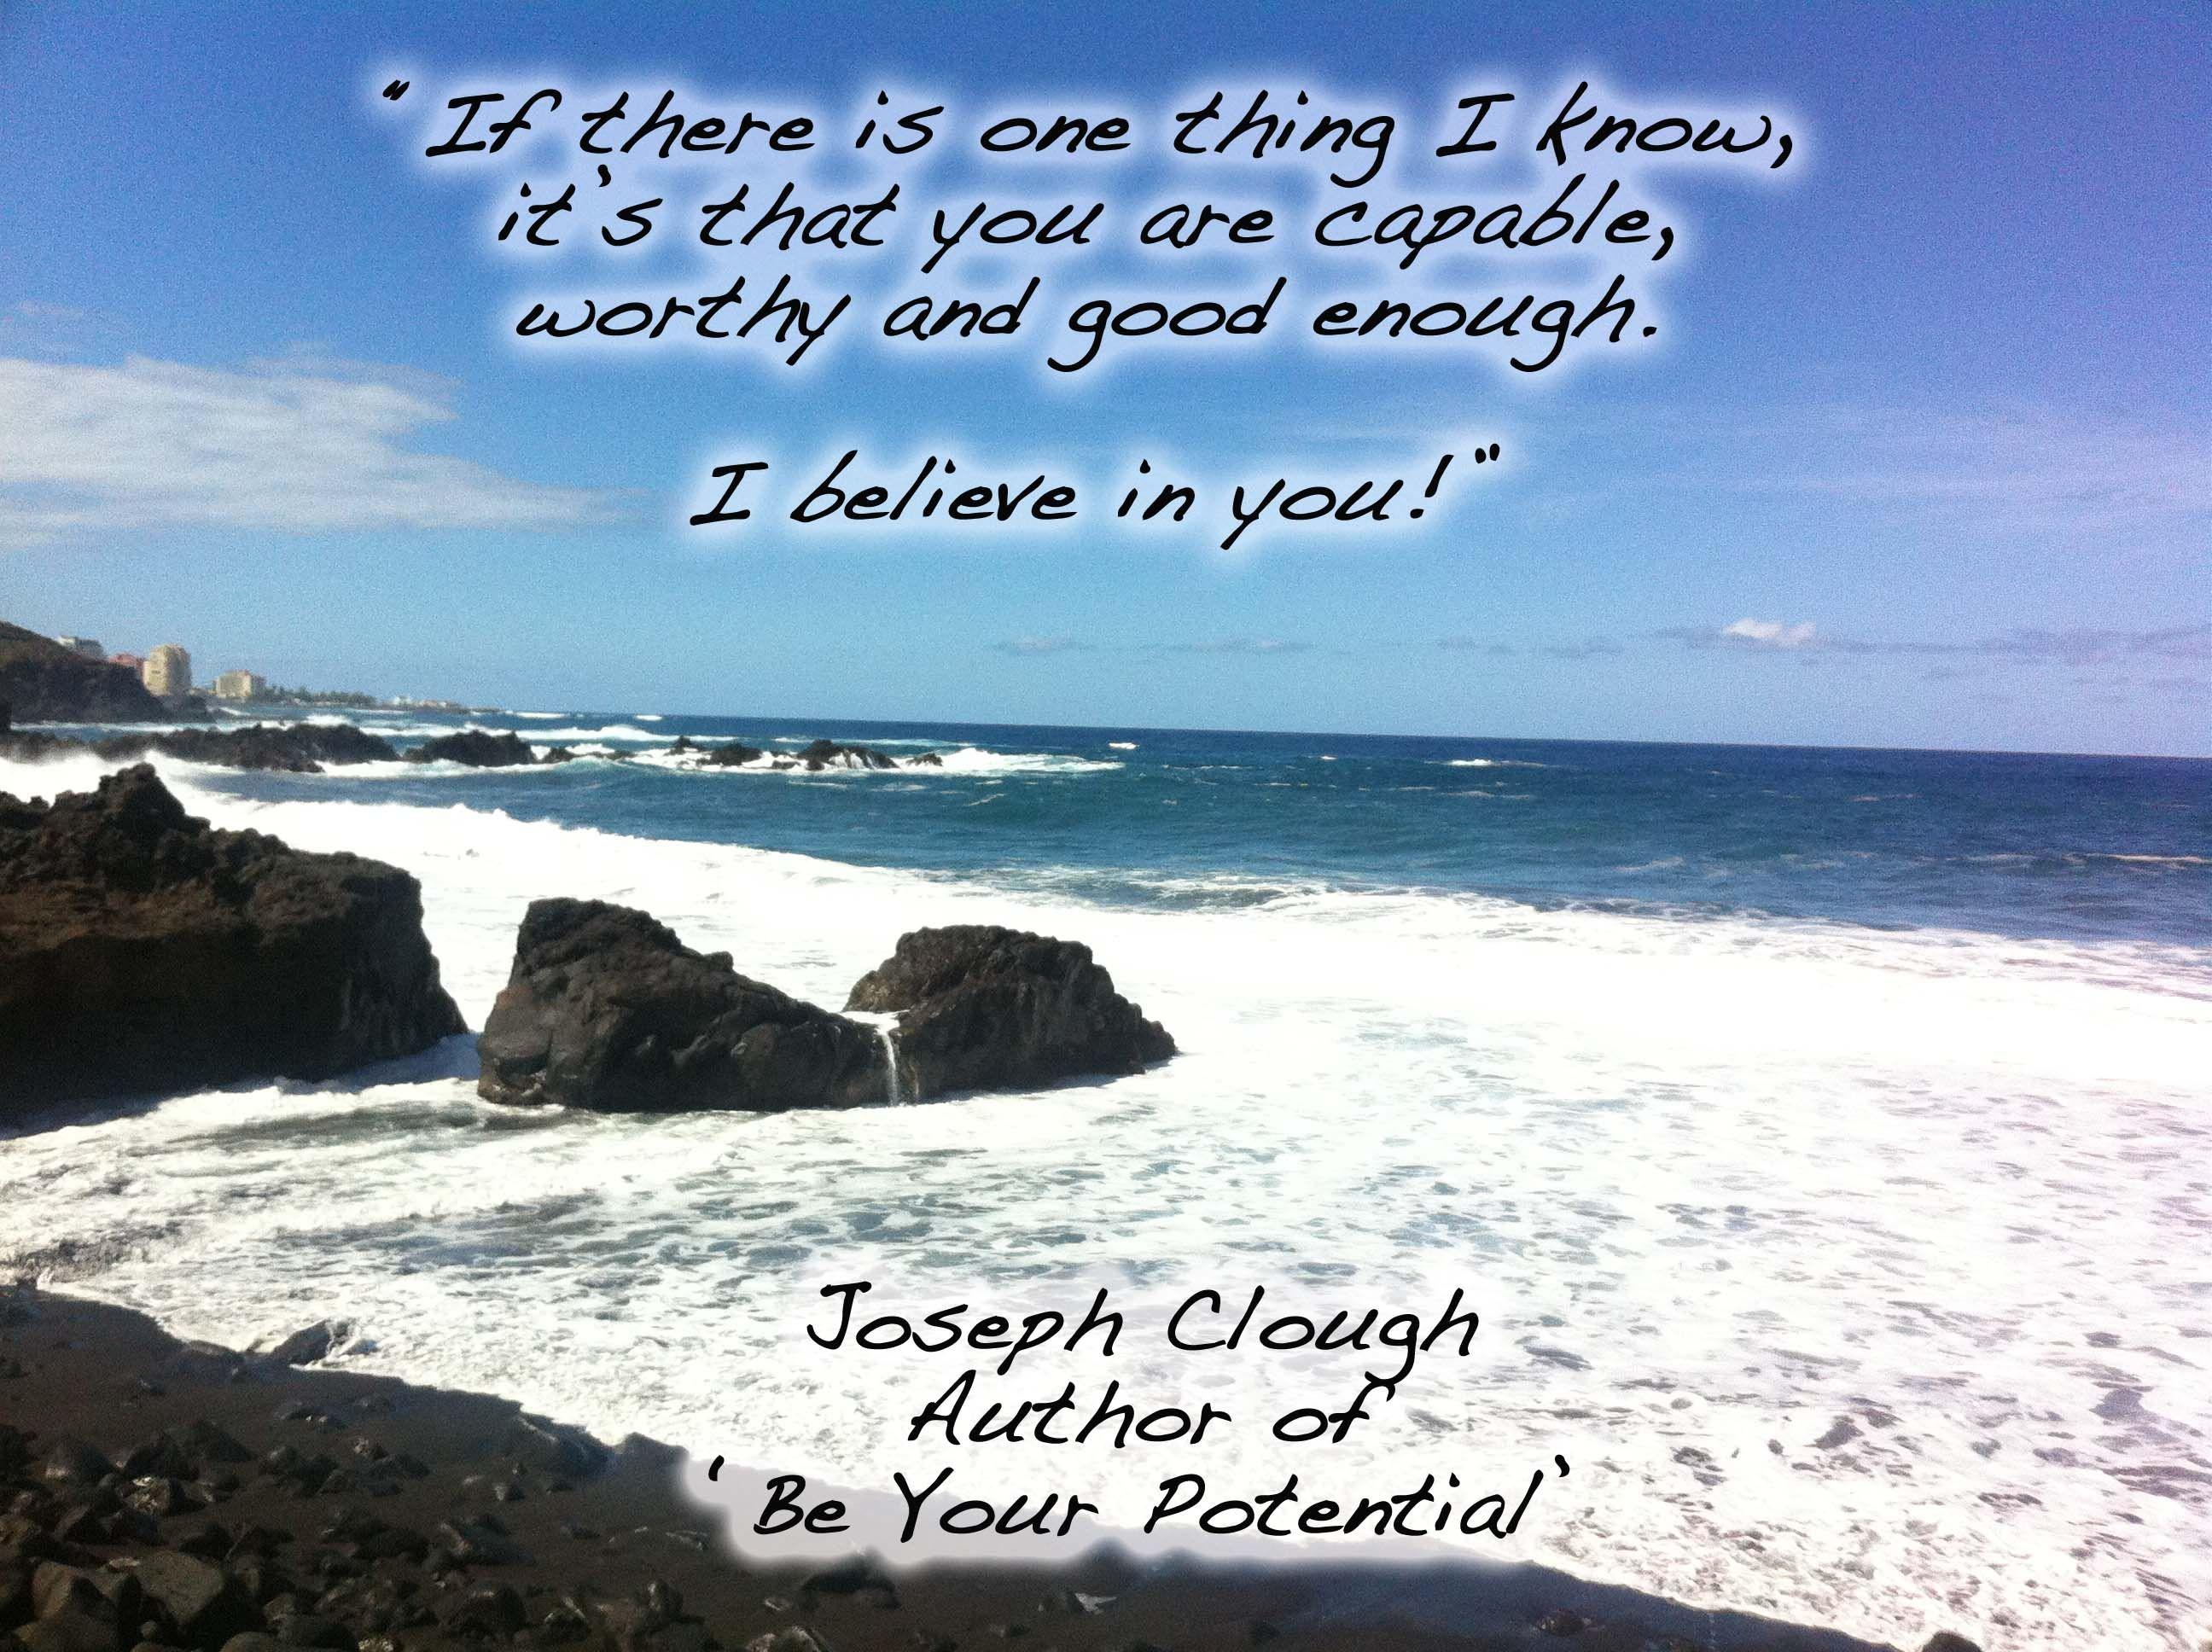 I believe in you! JC